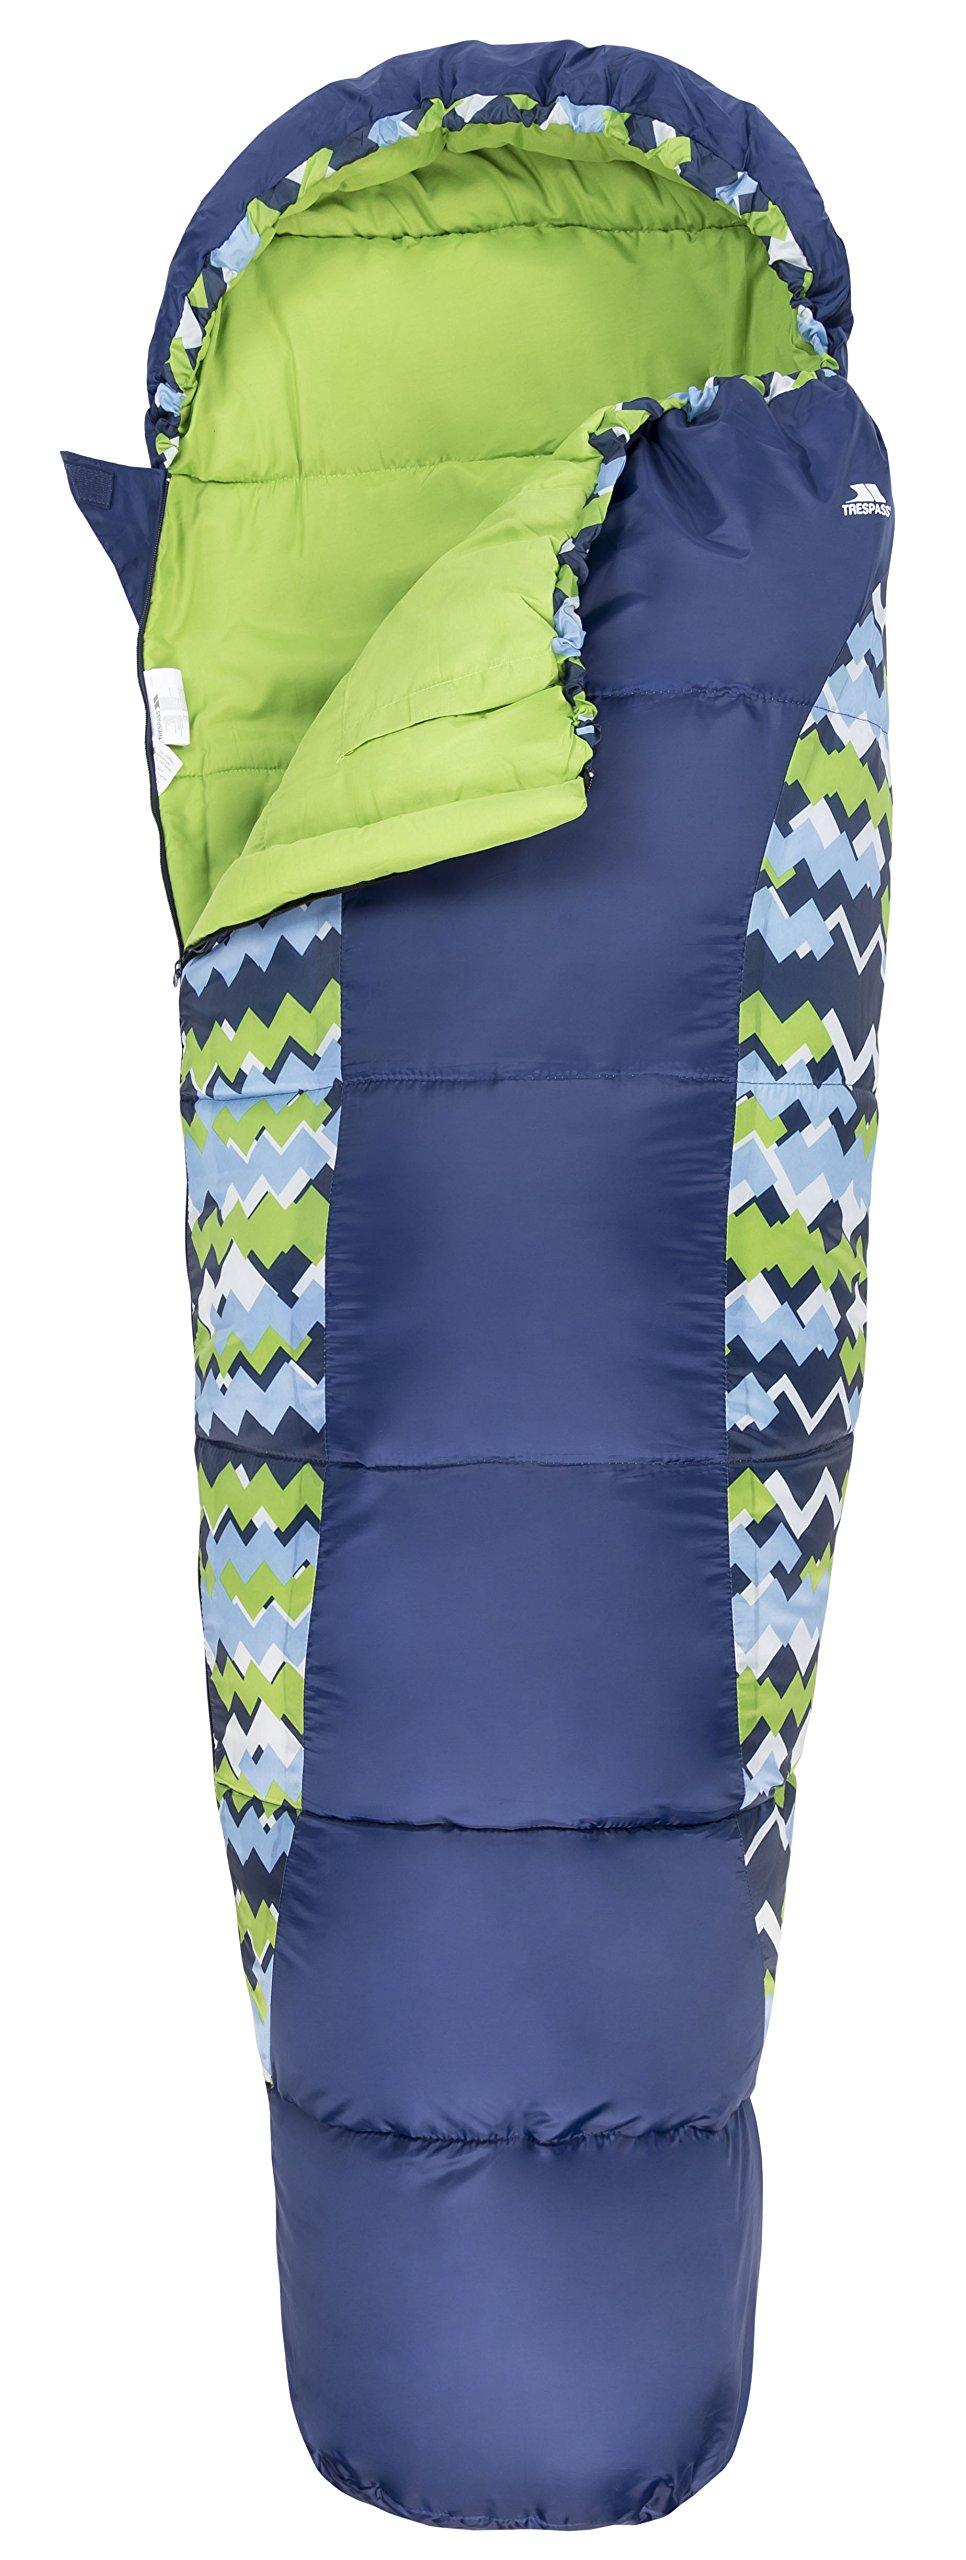 Trespass Unisex Child BUNKA 3 Season Sleeping Bag with Hollow Fibre Filling 4